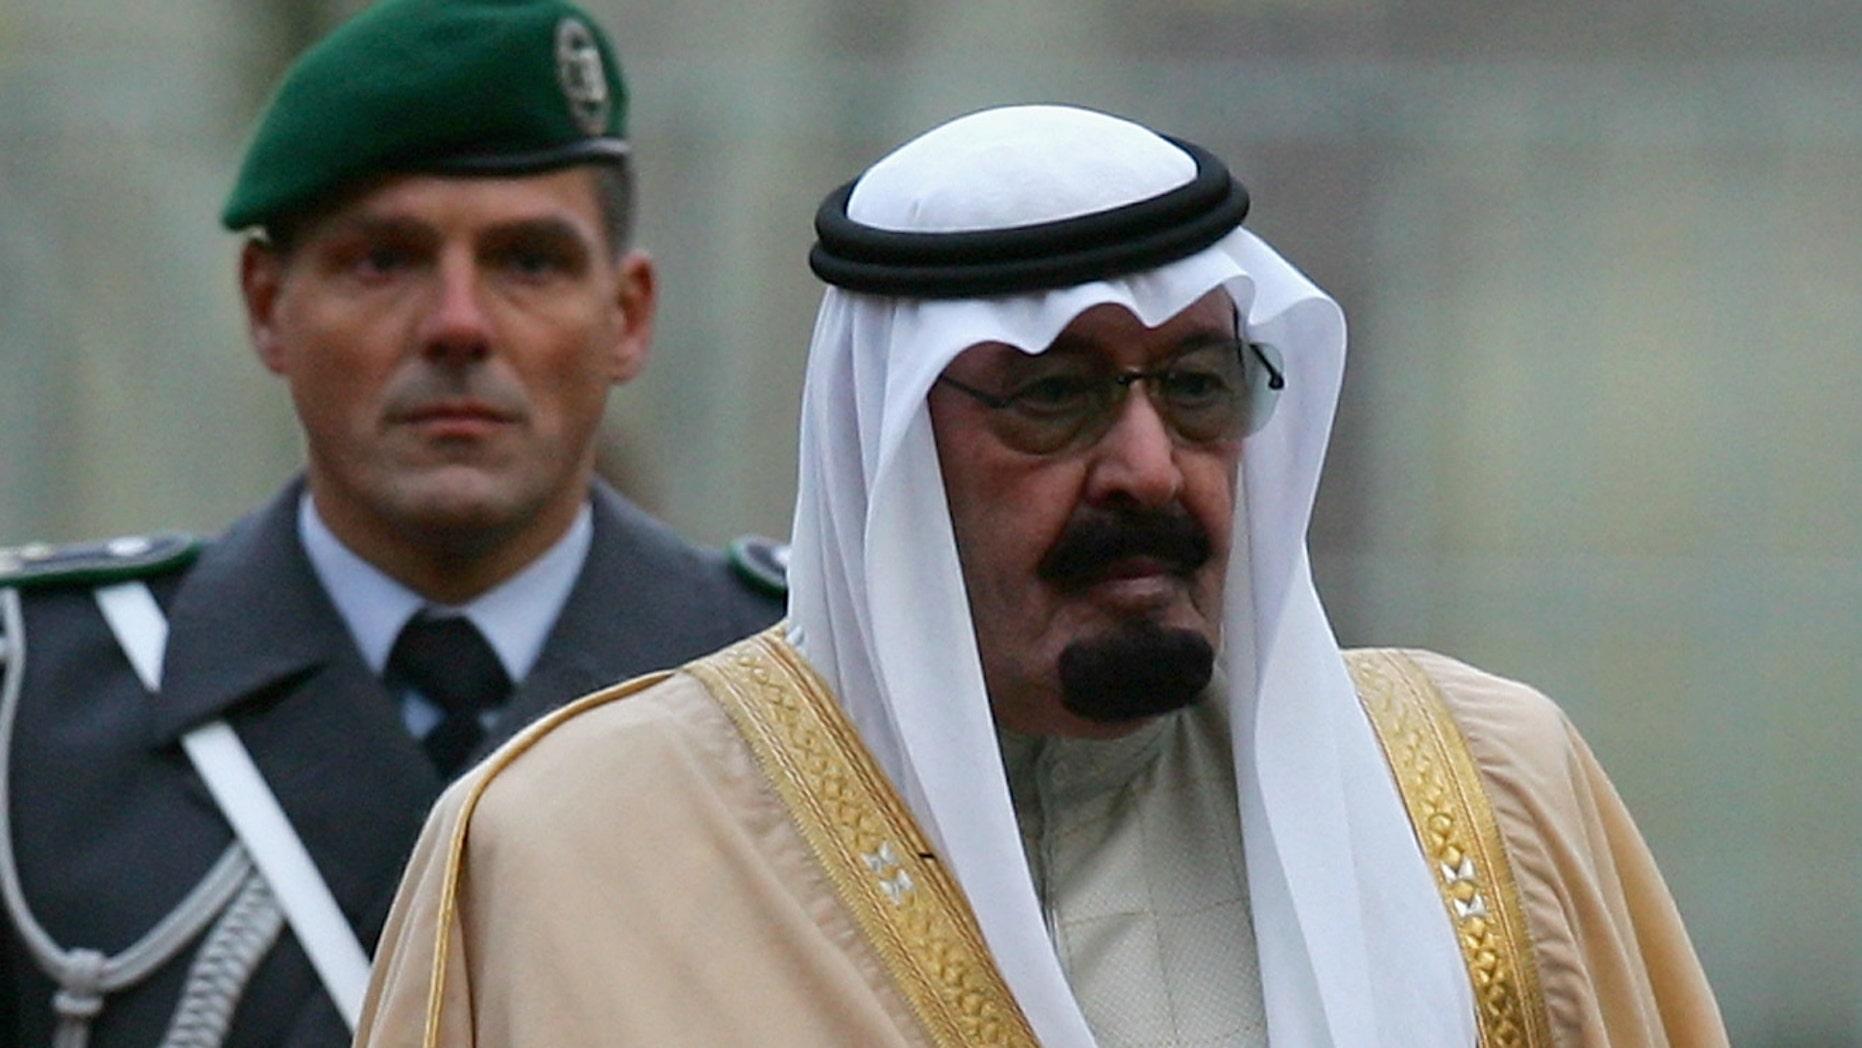 King Abdullah of Saudi Arabia (Photo by Andreas Rentz/Getty Images)